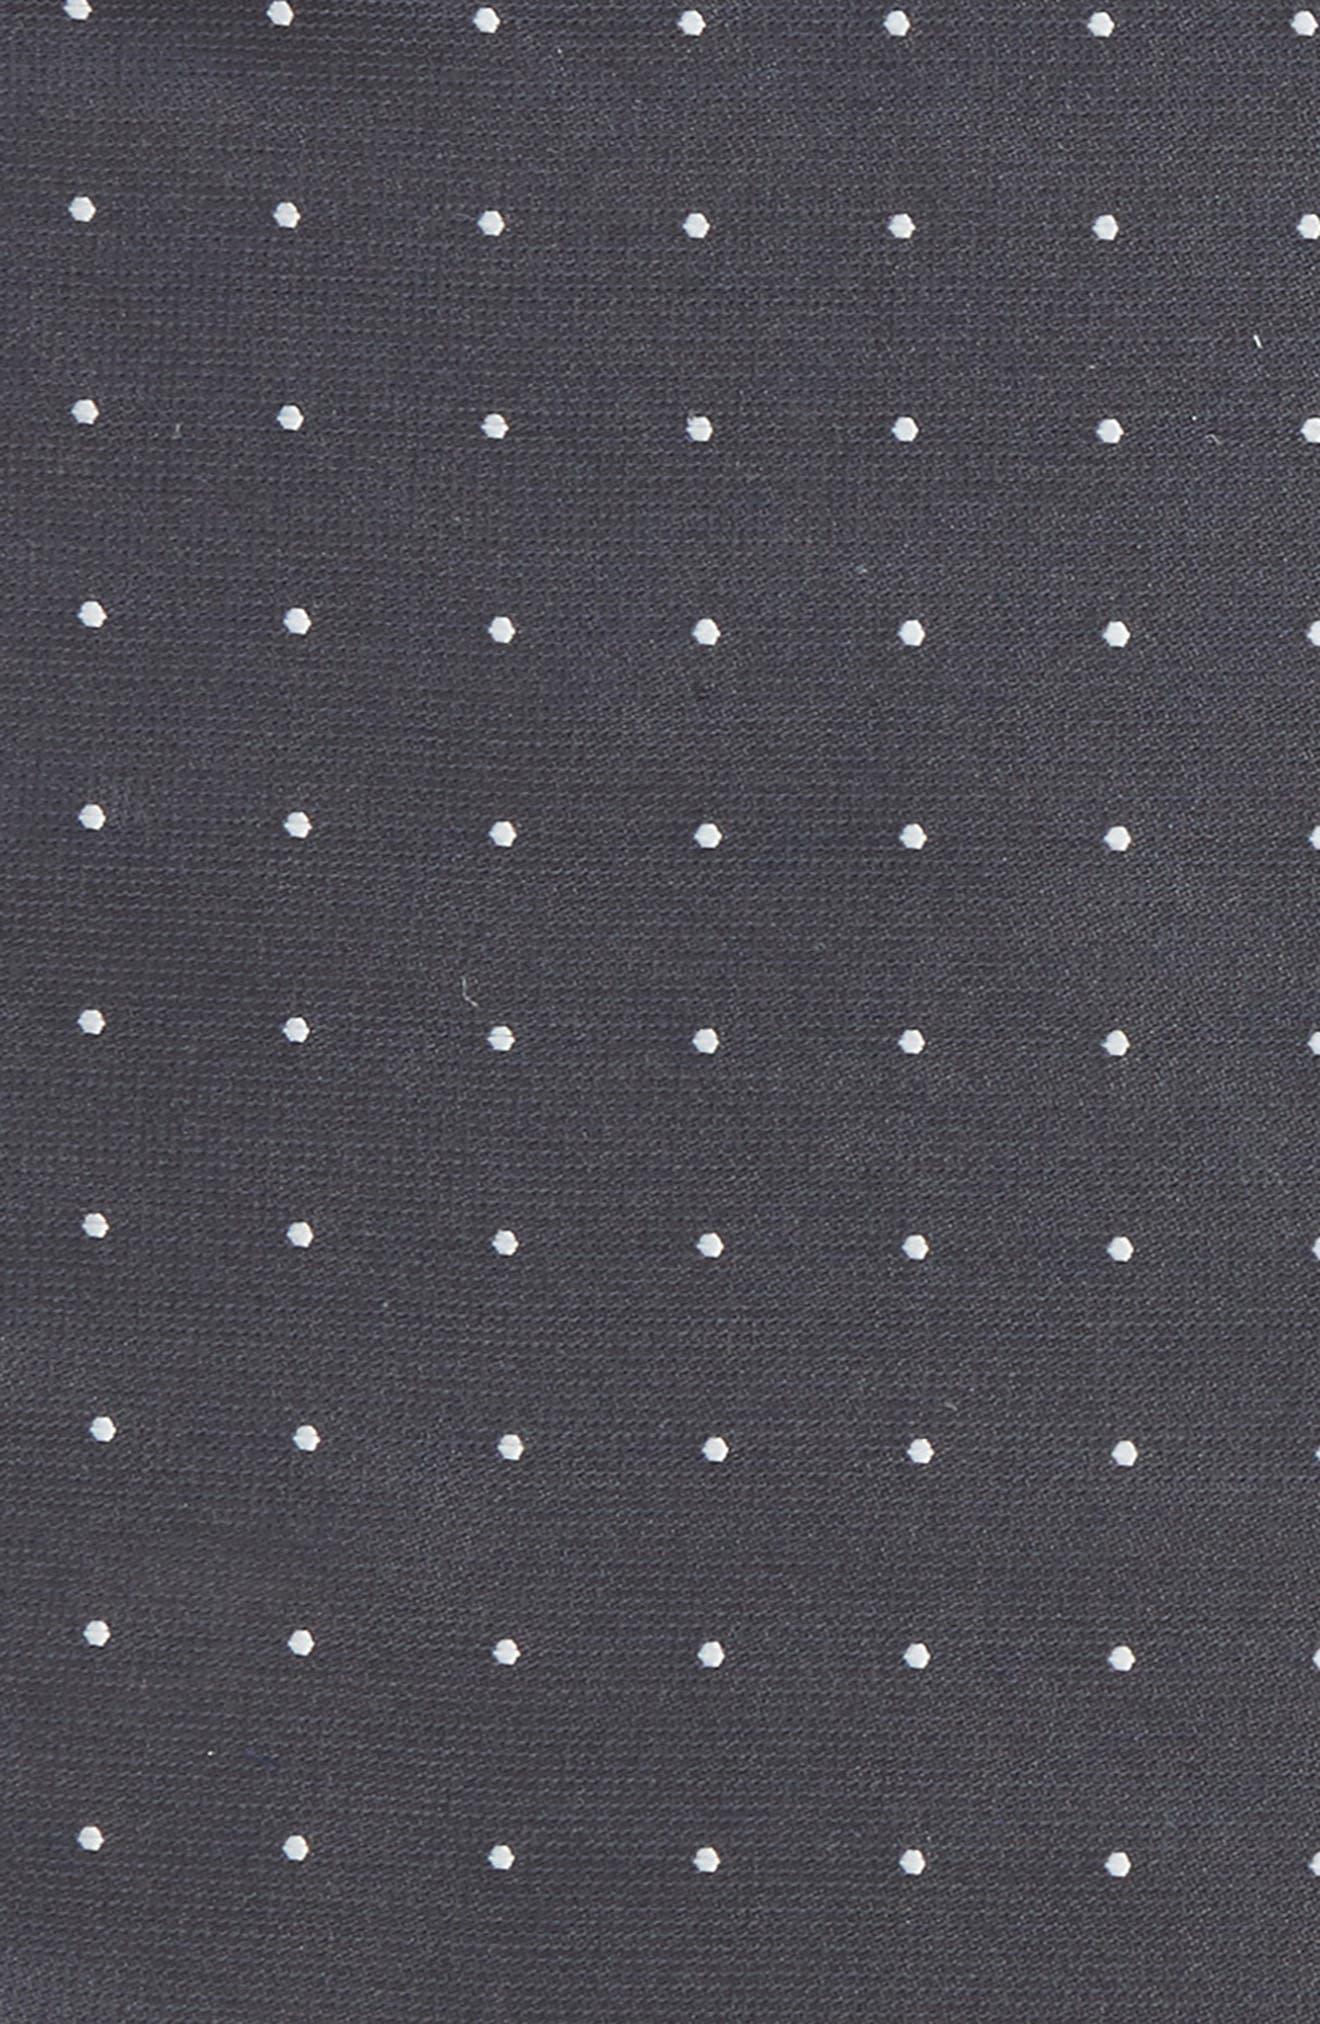 Dot Silk Pocket Square,                             Alternate thumbnail 3, color,                             Charcoal